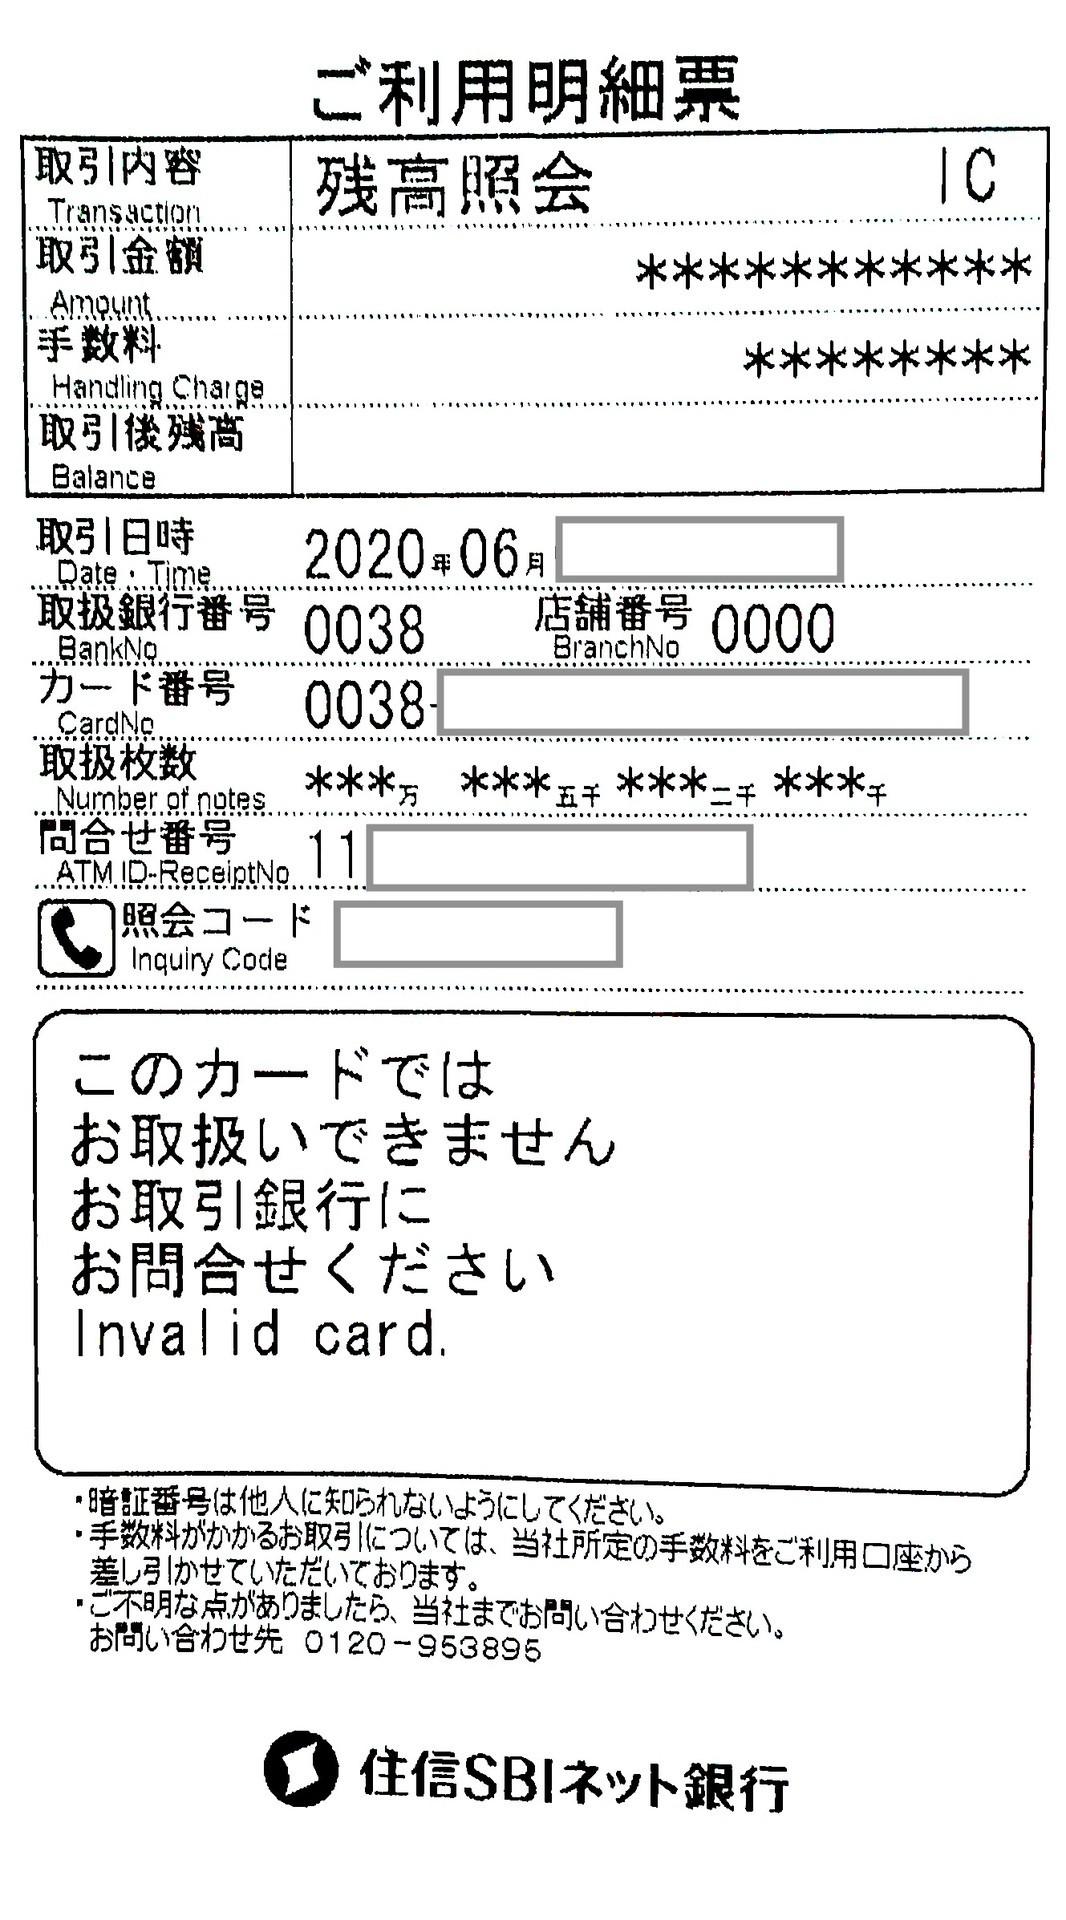 f:id:atsuhiro-me:20200603145702j:plain:w360